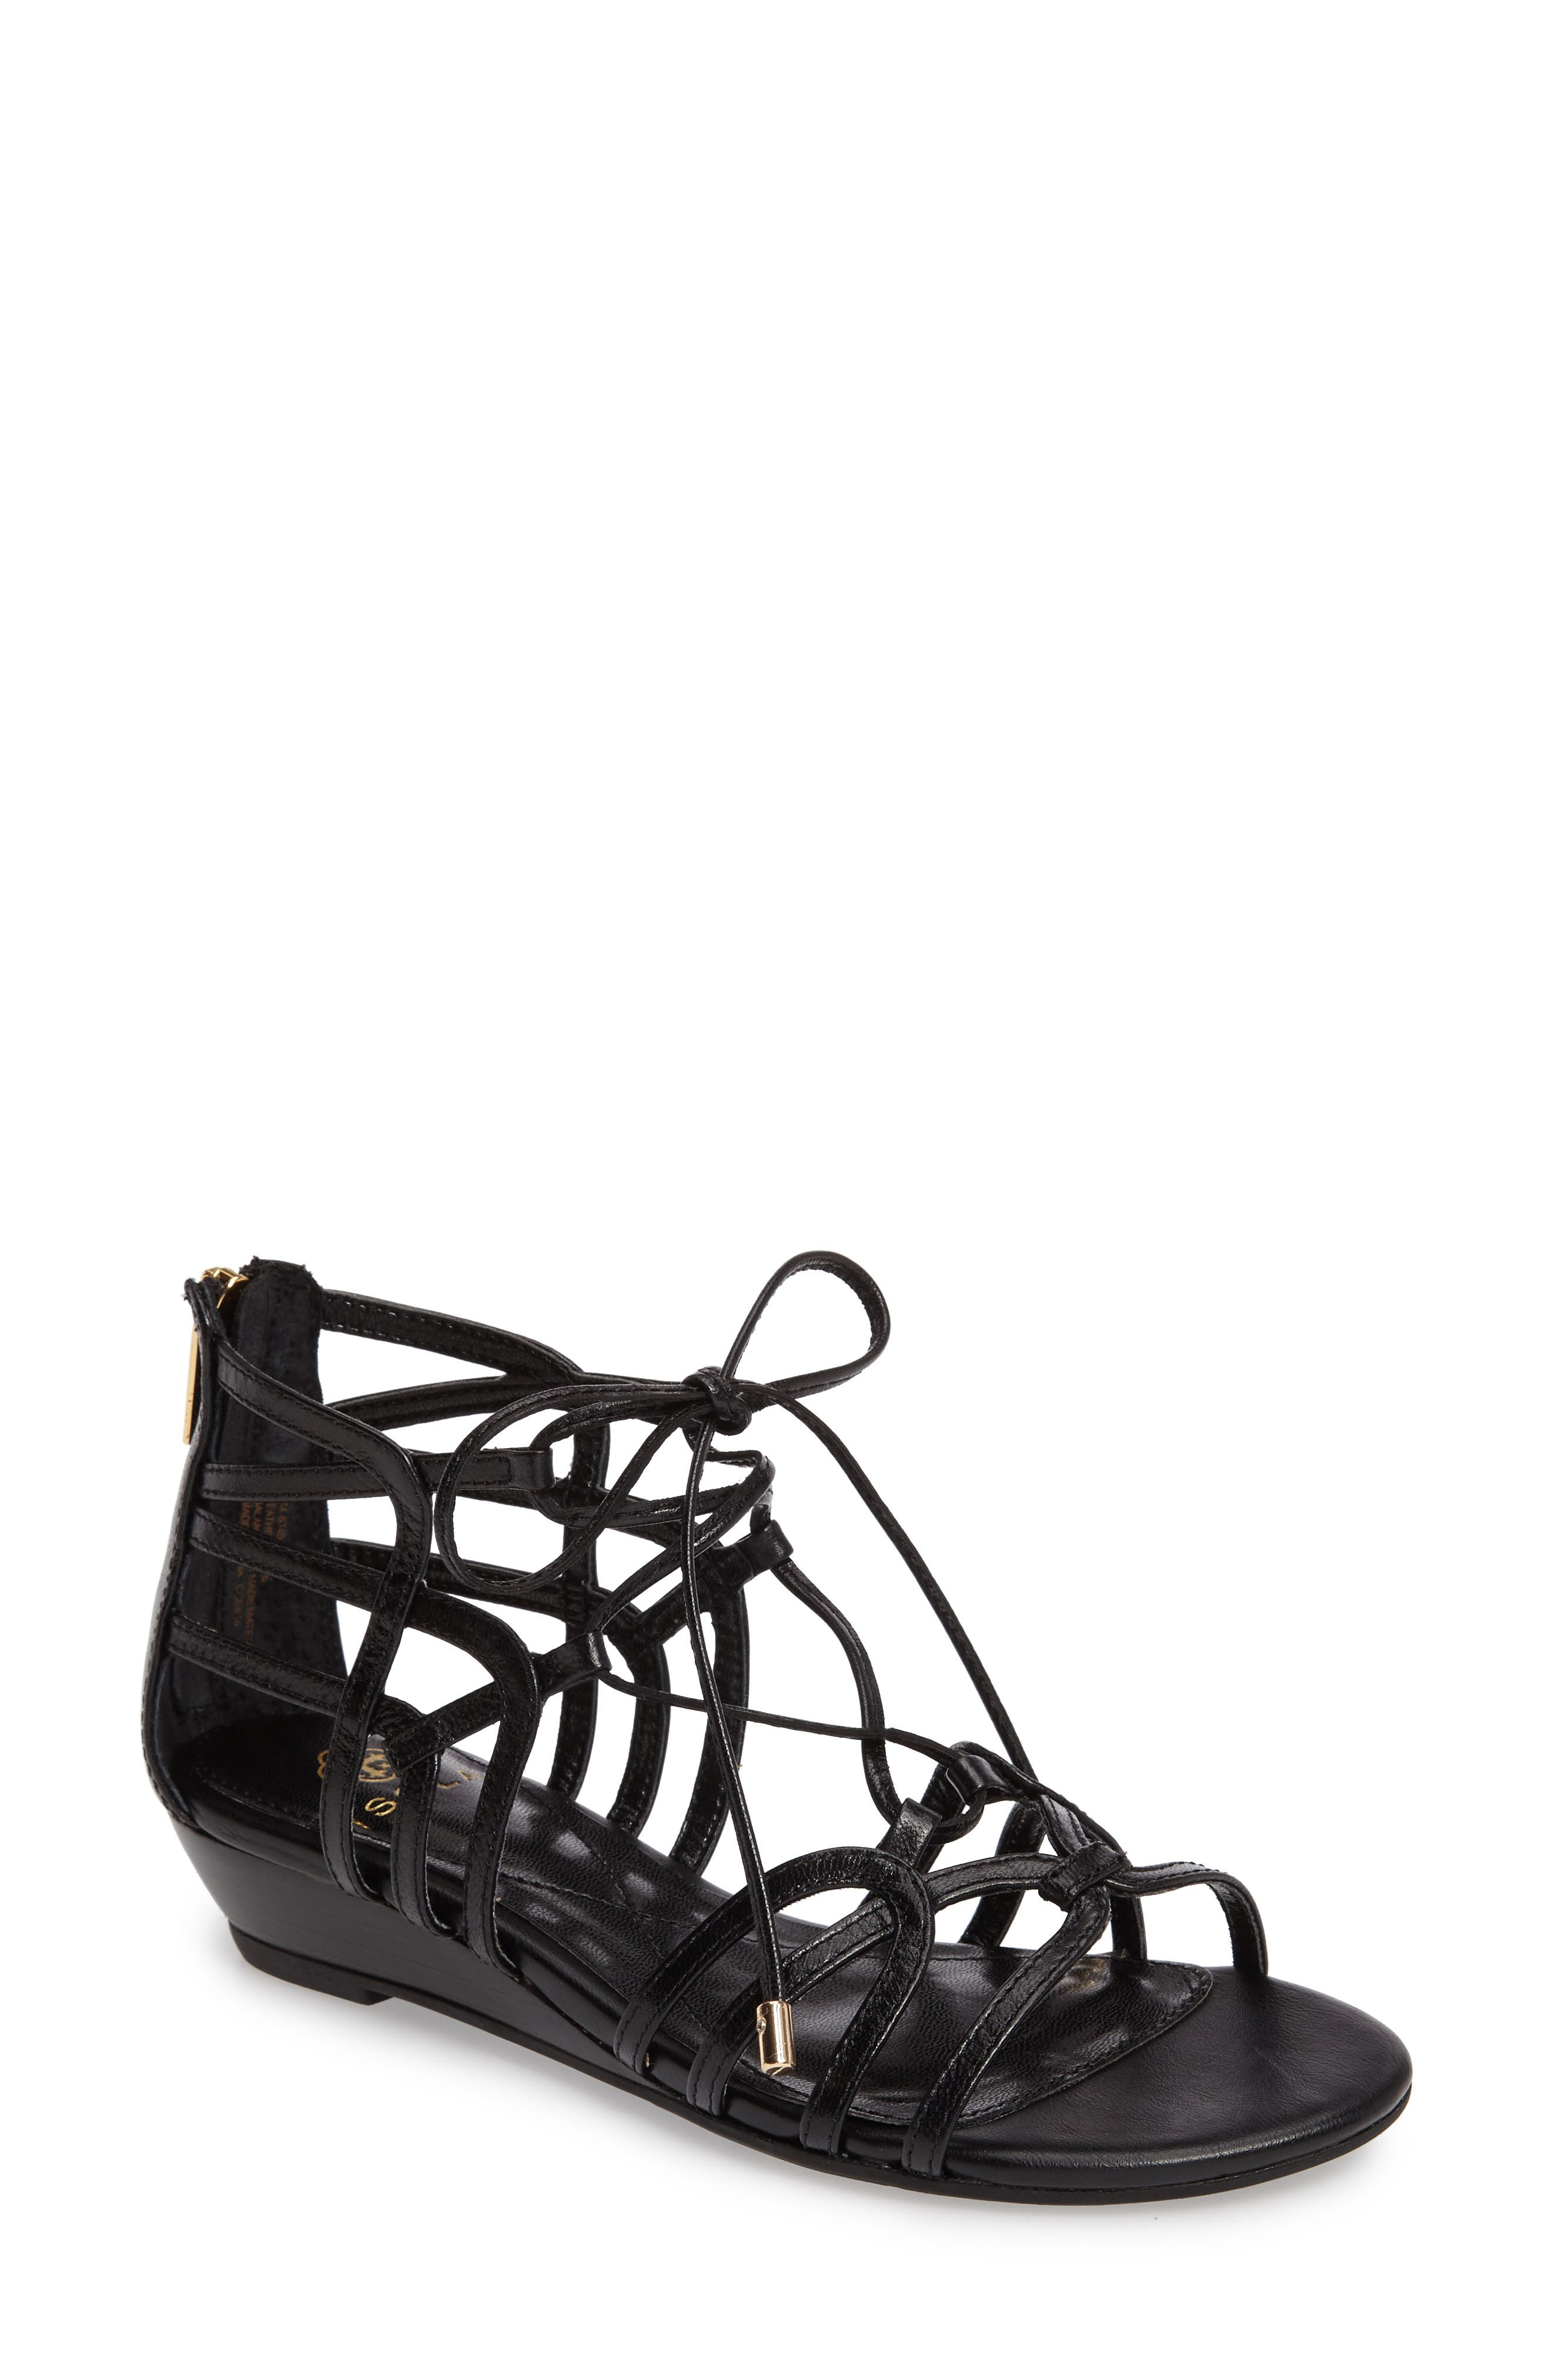 Elisia Lace-Up Sandal,                             Main thumbnail 1, color,                             BLACK LEATHER